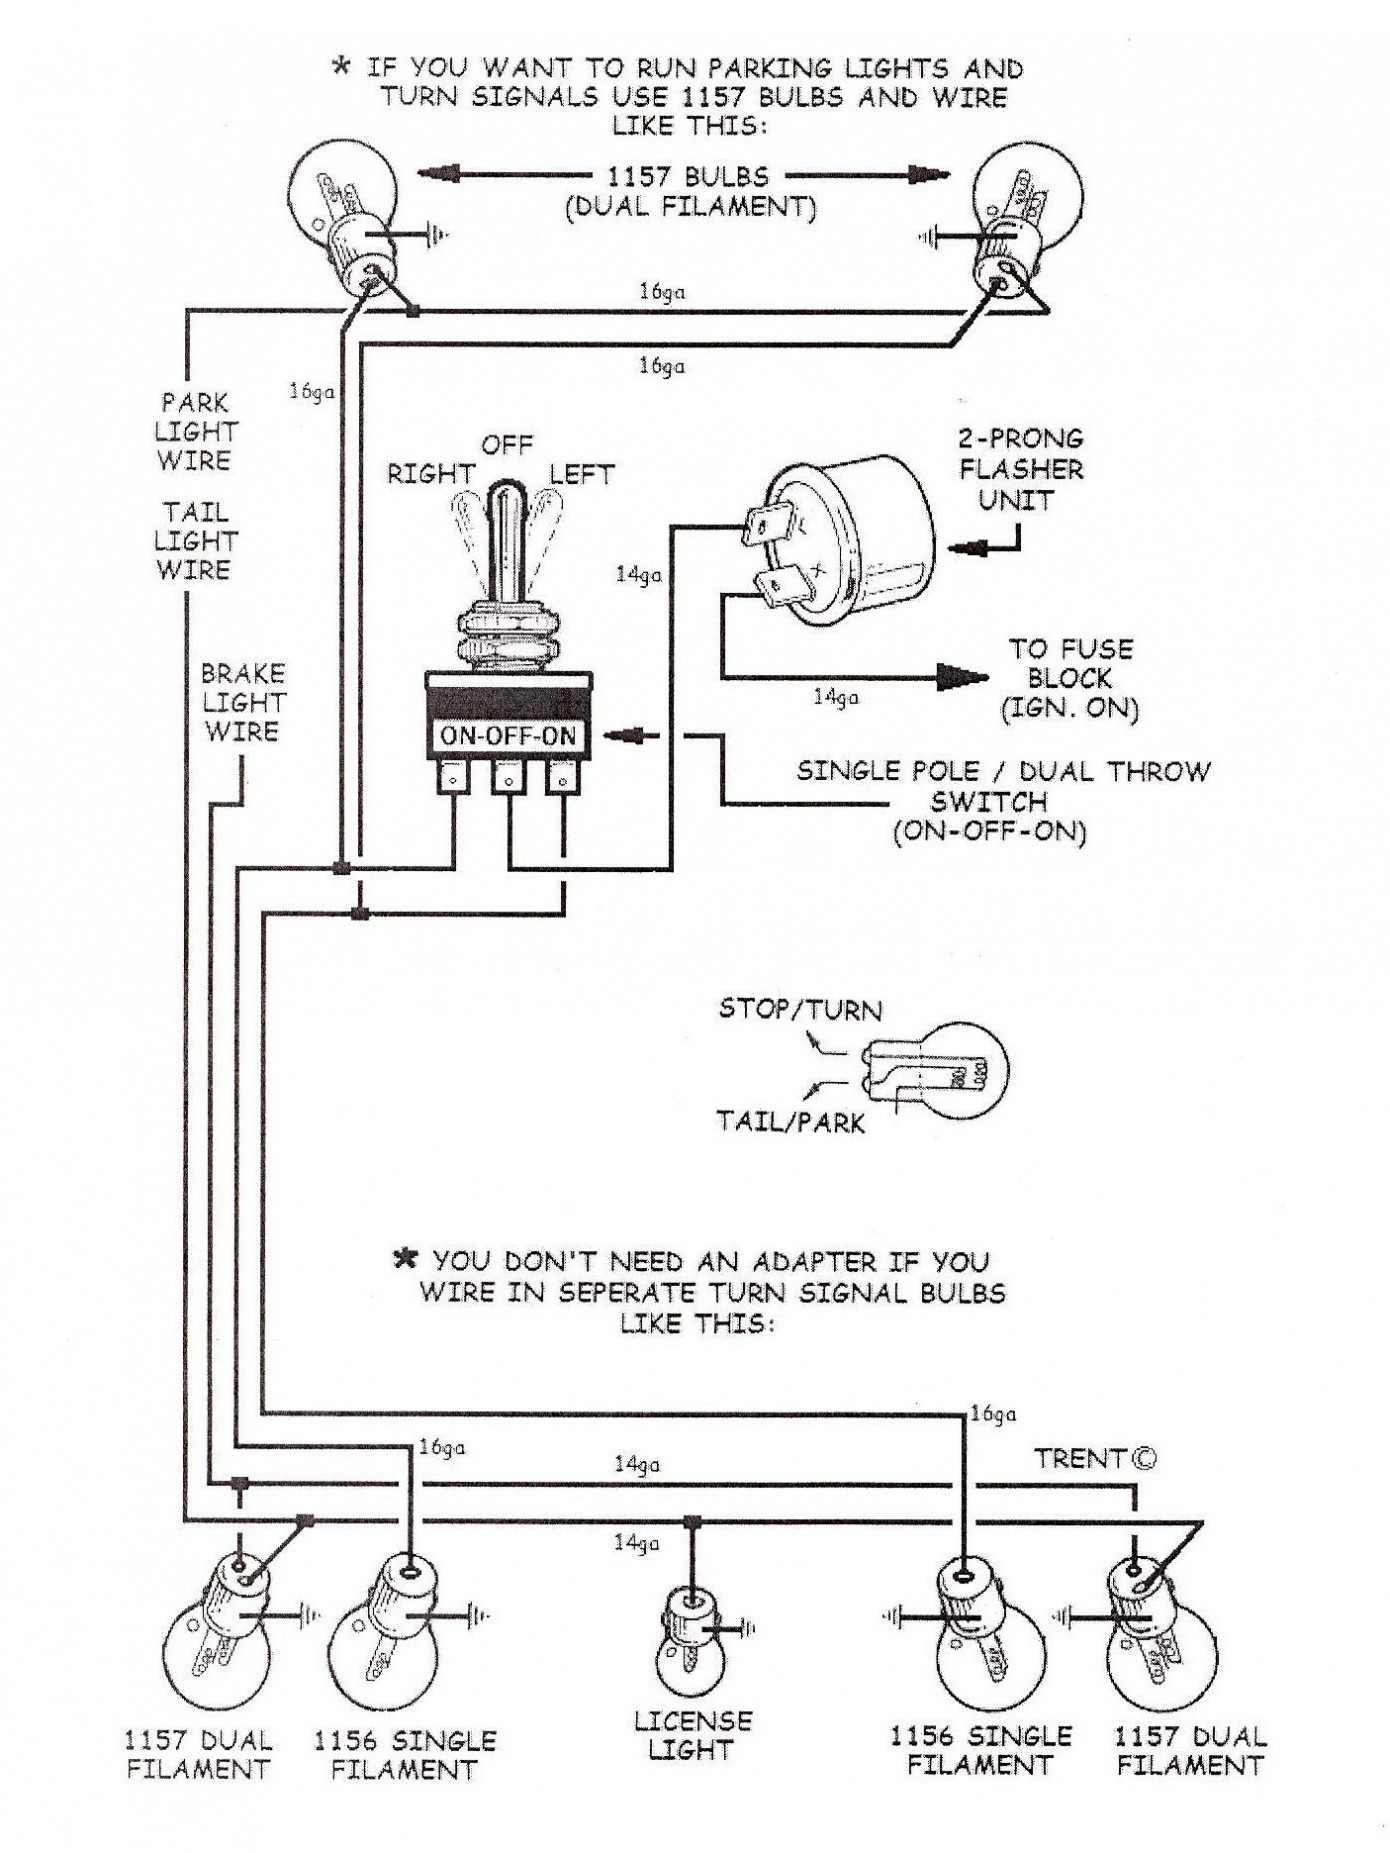 1157 light bulb wiring diagram enthusiast wiring diagrams u2022 rh rasalibre co Simple Brake Light Wiring